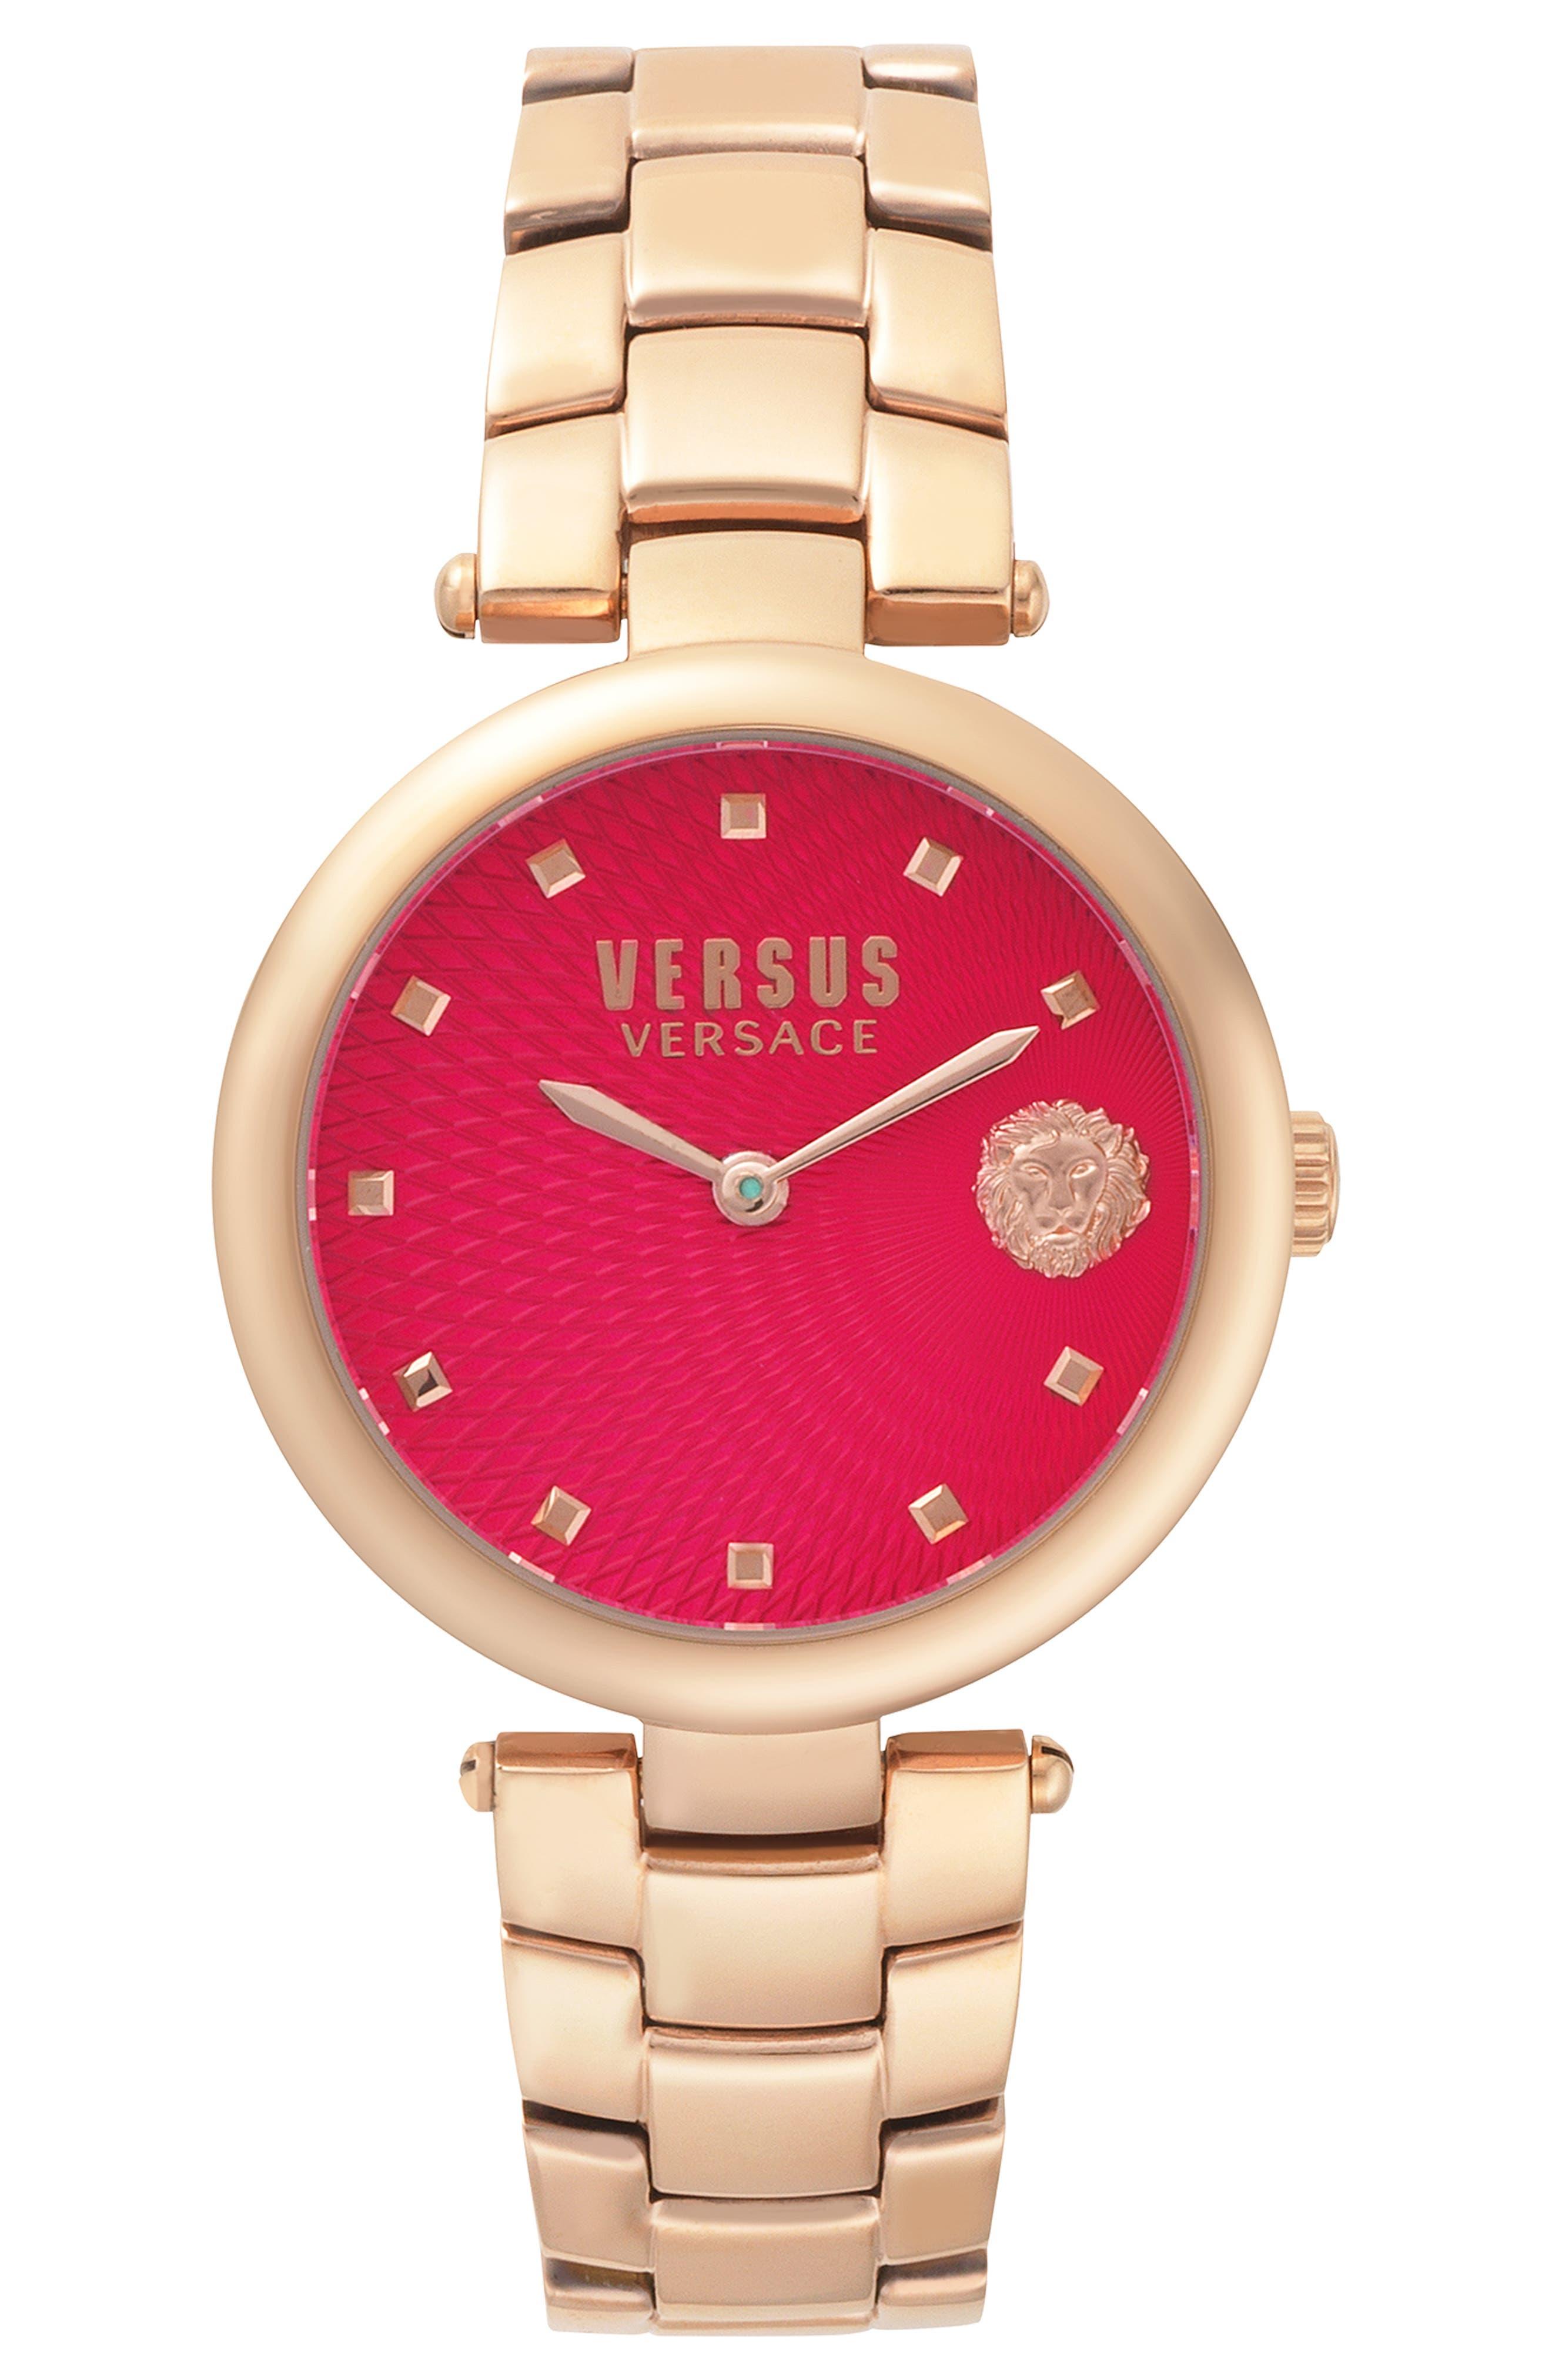 VERSUS VERSACE Buffle Bay Bracelet Watch, 36mm, Main, color, ROSE GOLD/ RED